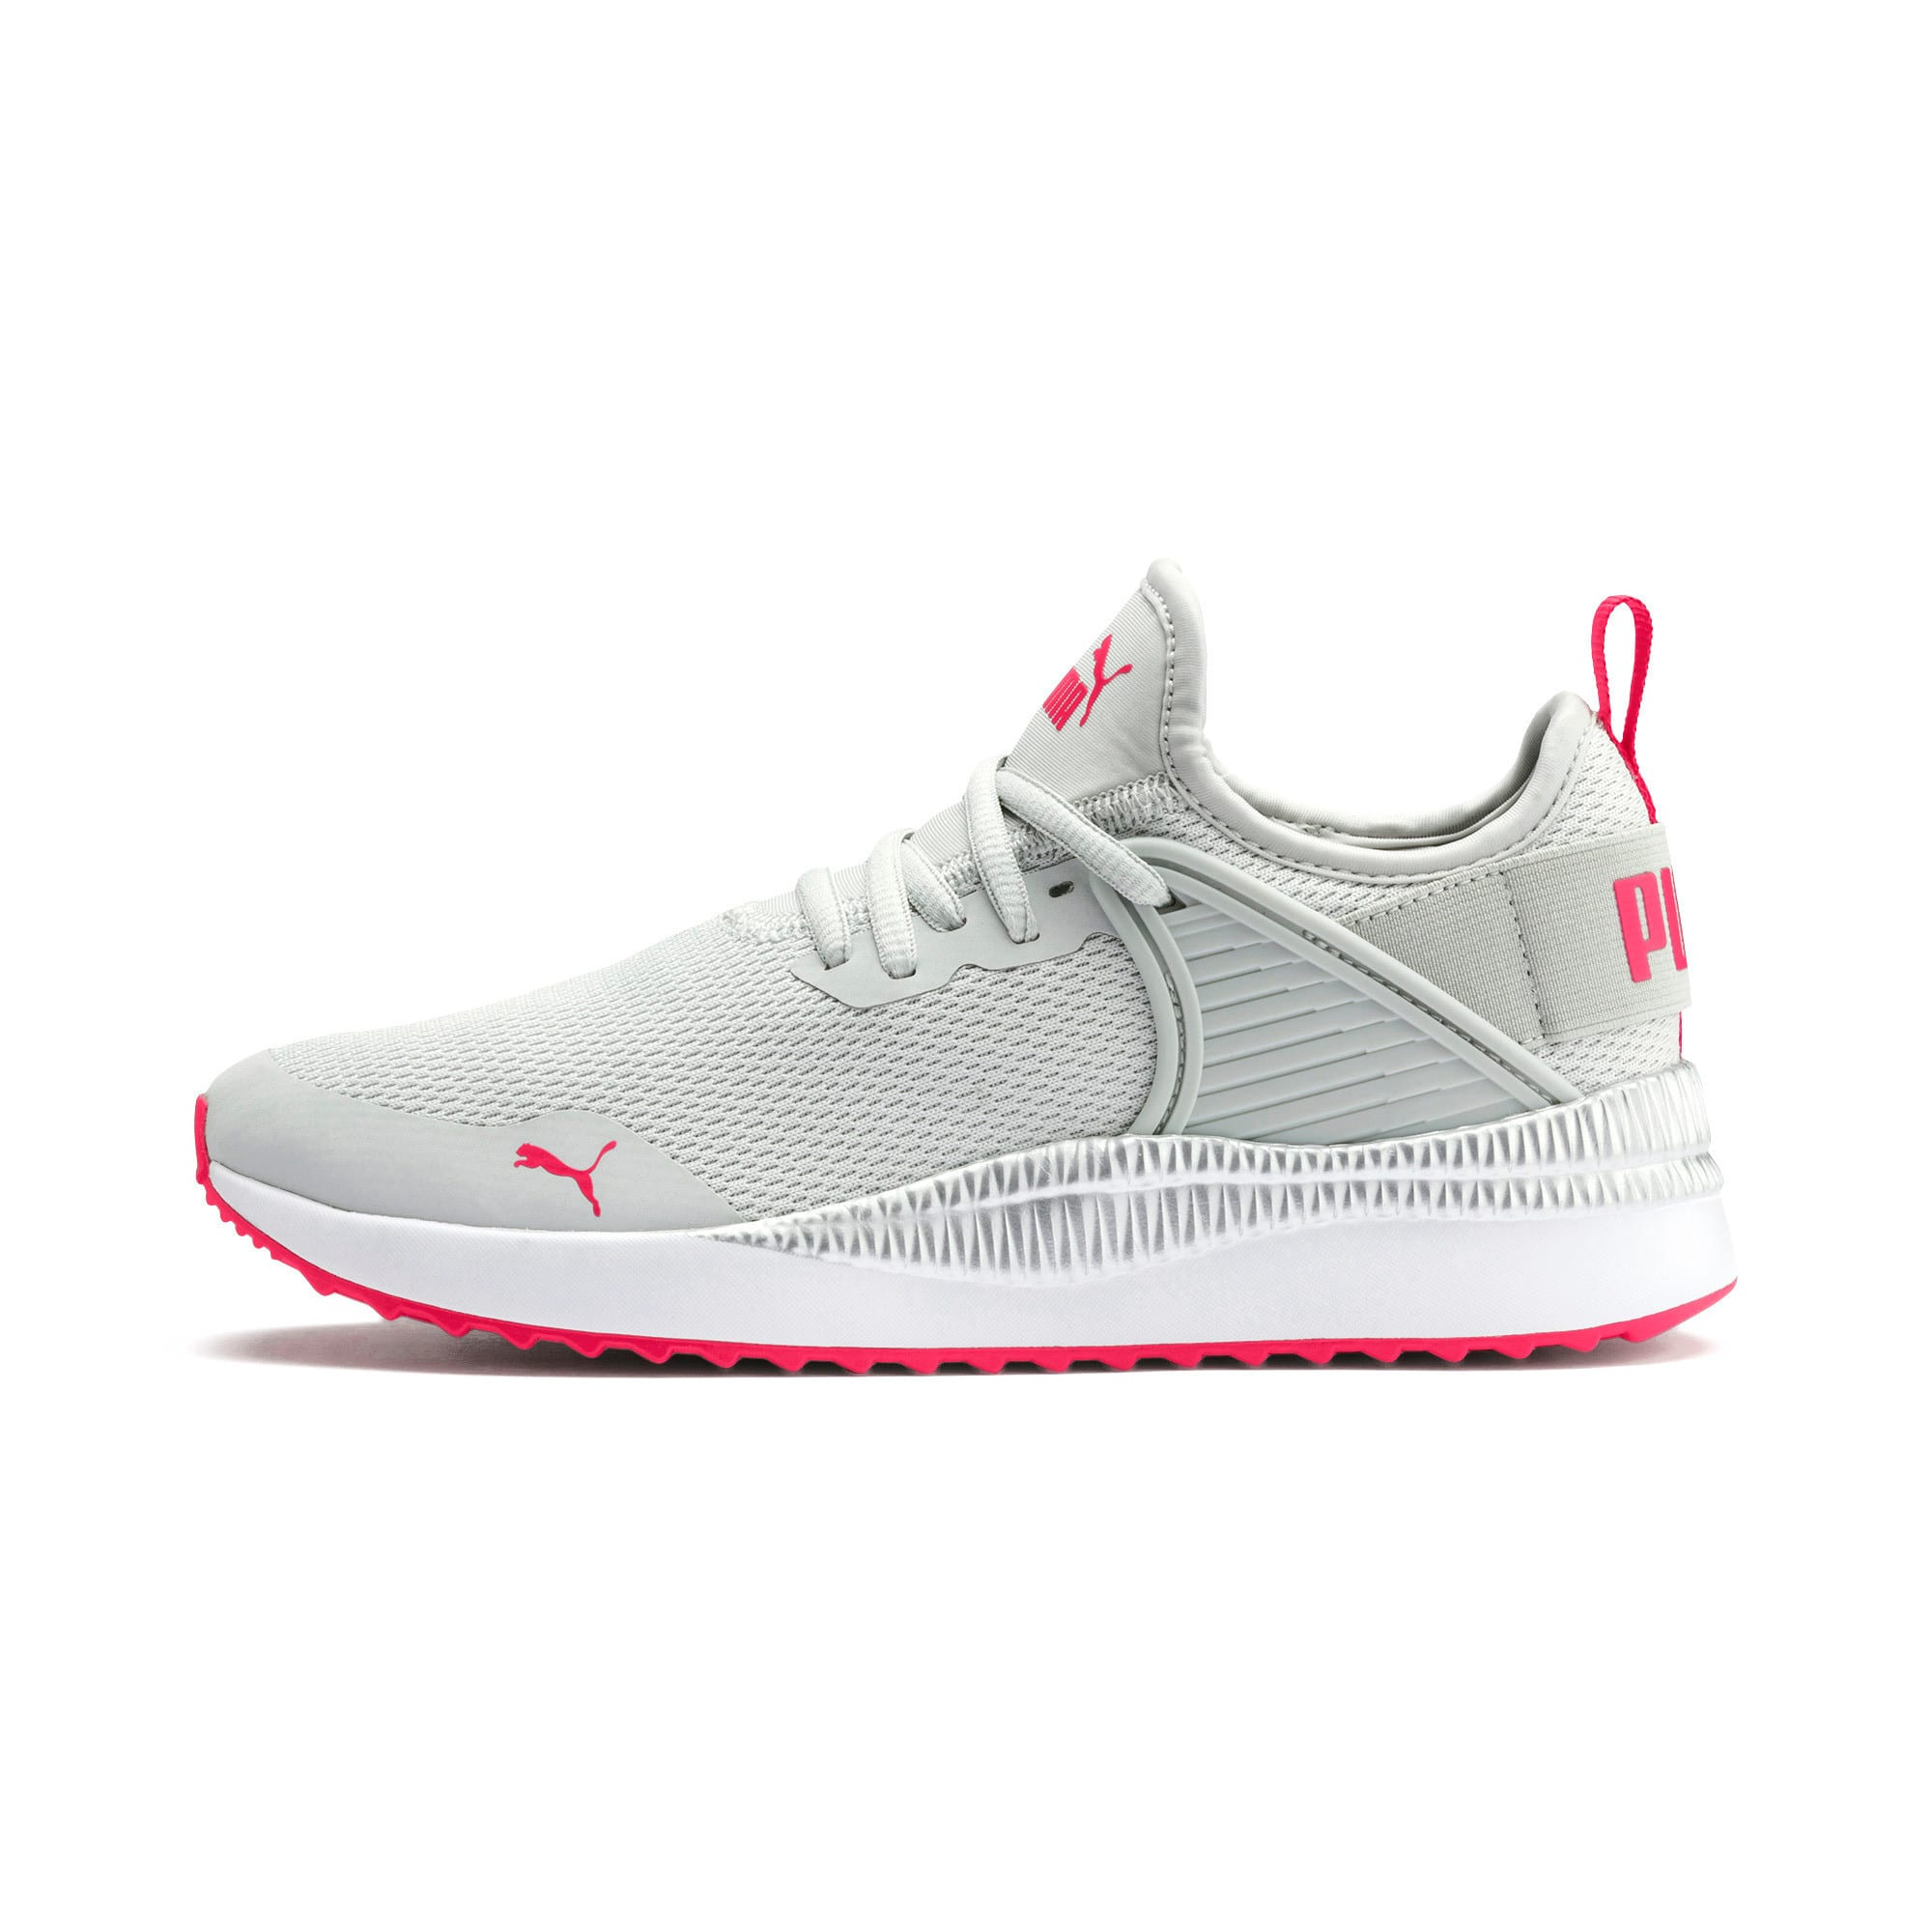 Thumbnail 1 of Pacer Next Cage Metallic Sneakers JR, Gray Violet-Nrgy Rose, medium